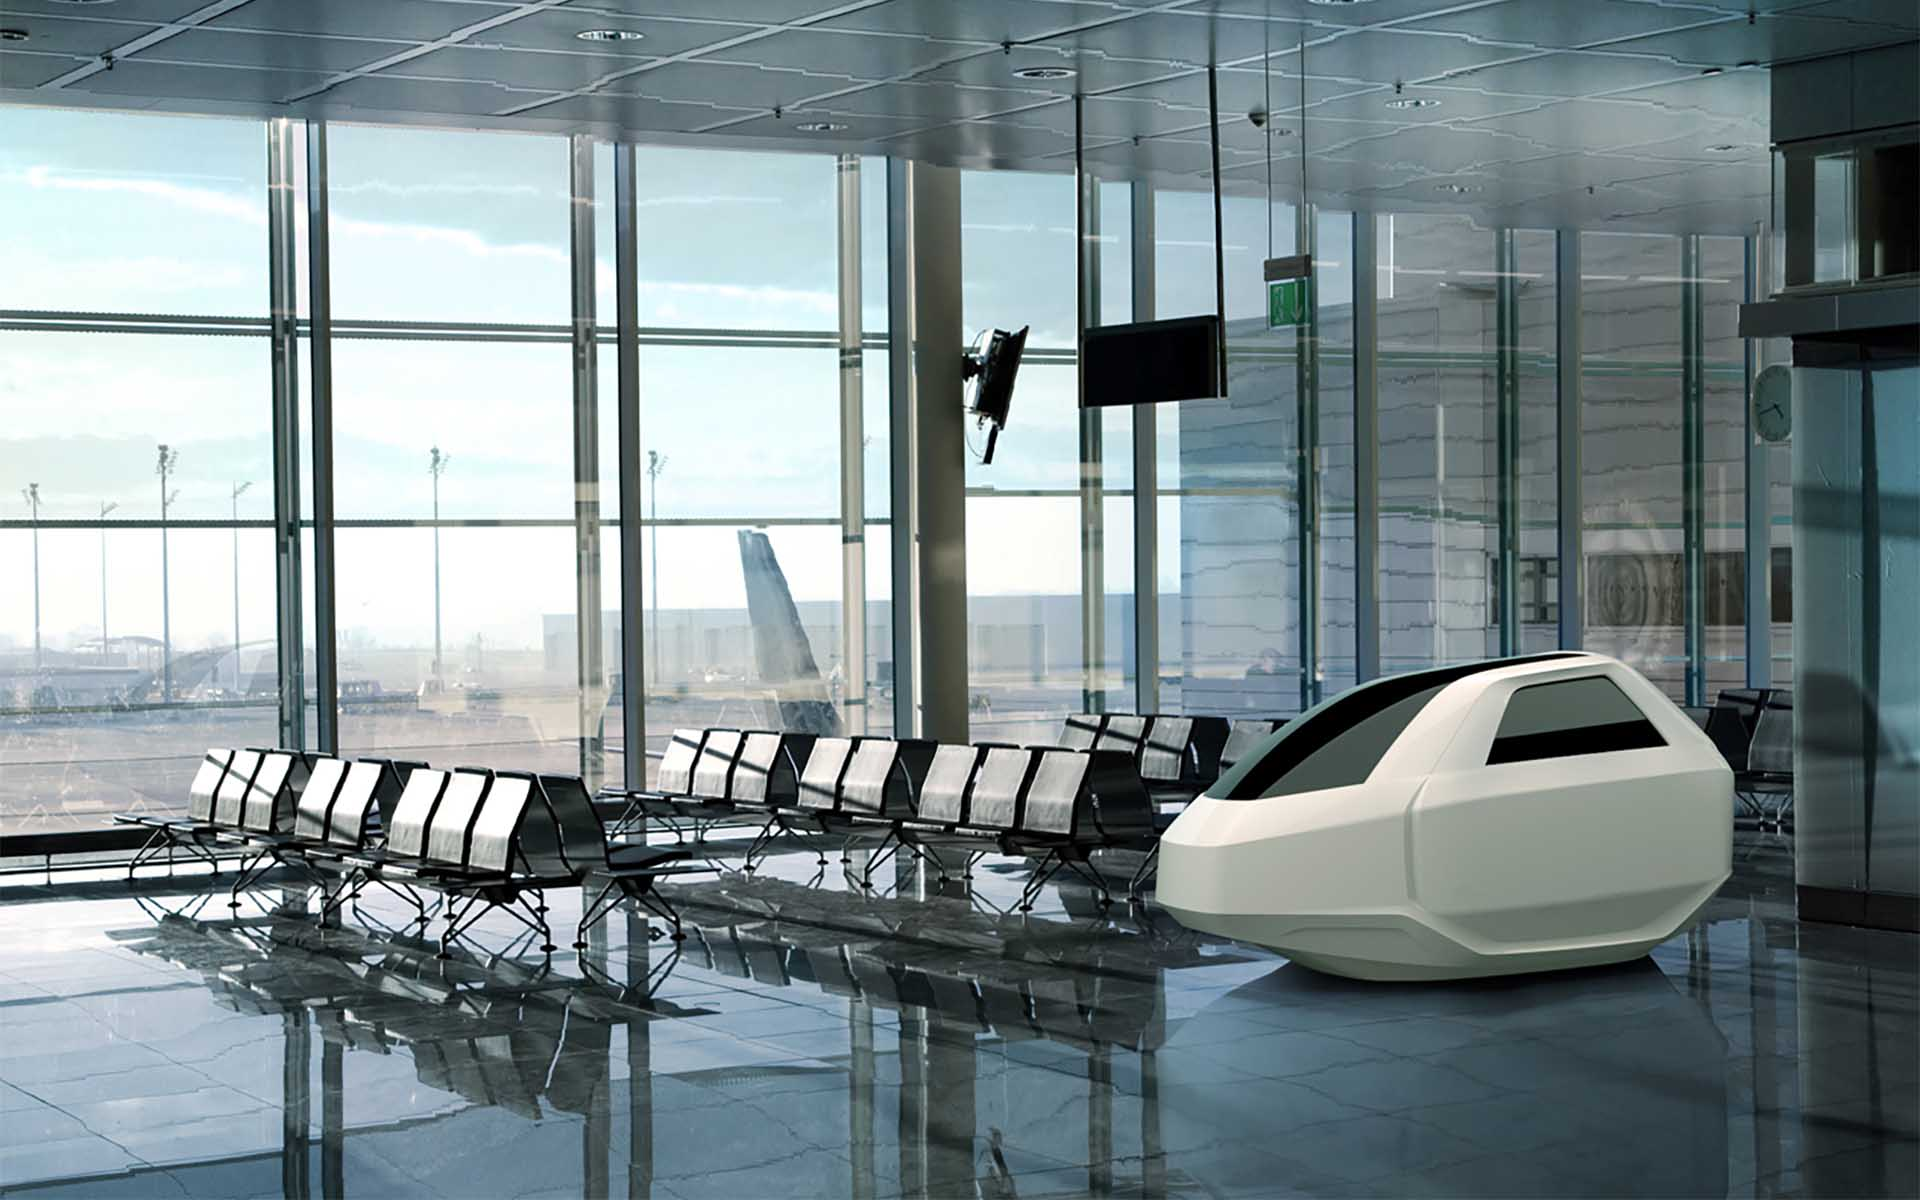 AirPod is Making Traveling Fun Again